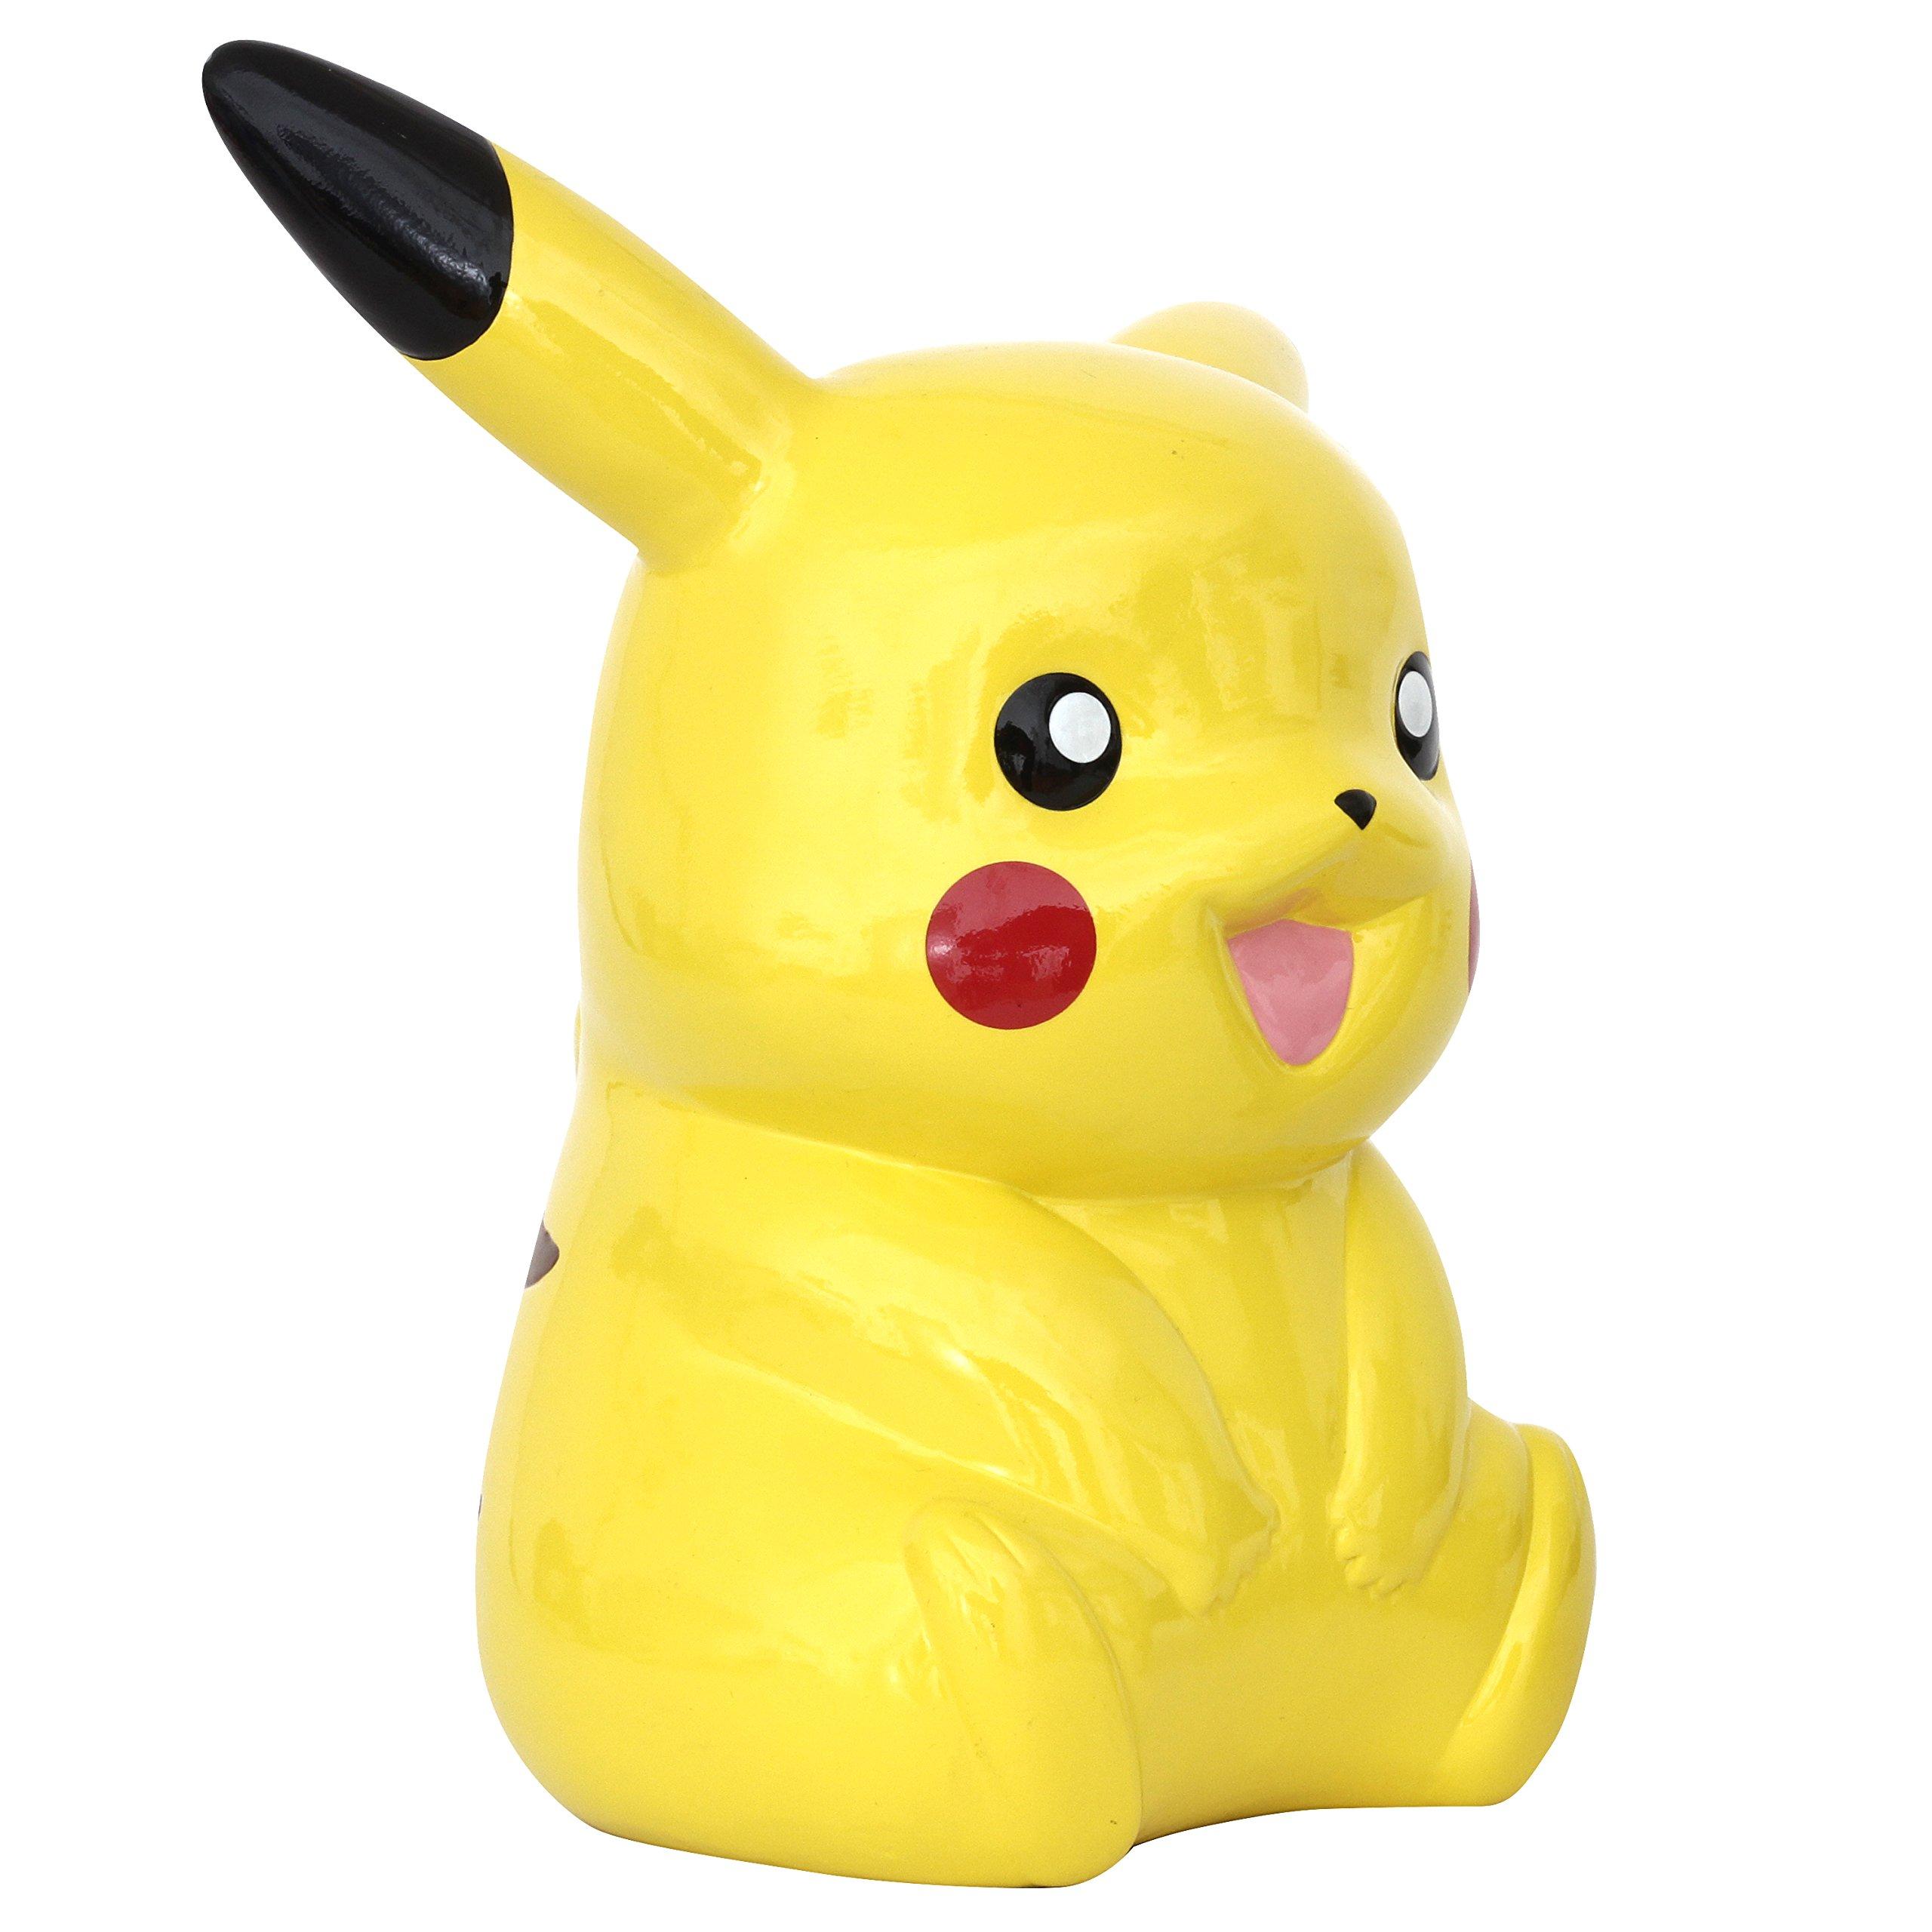 Fab Star Kid's Pikachu Bank, Yellow by Pokémon (Image #4)